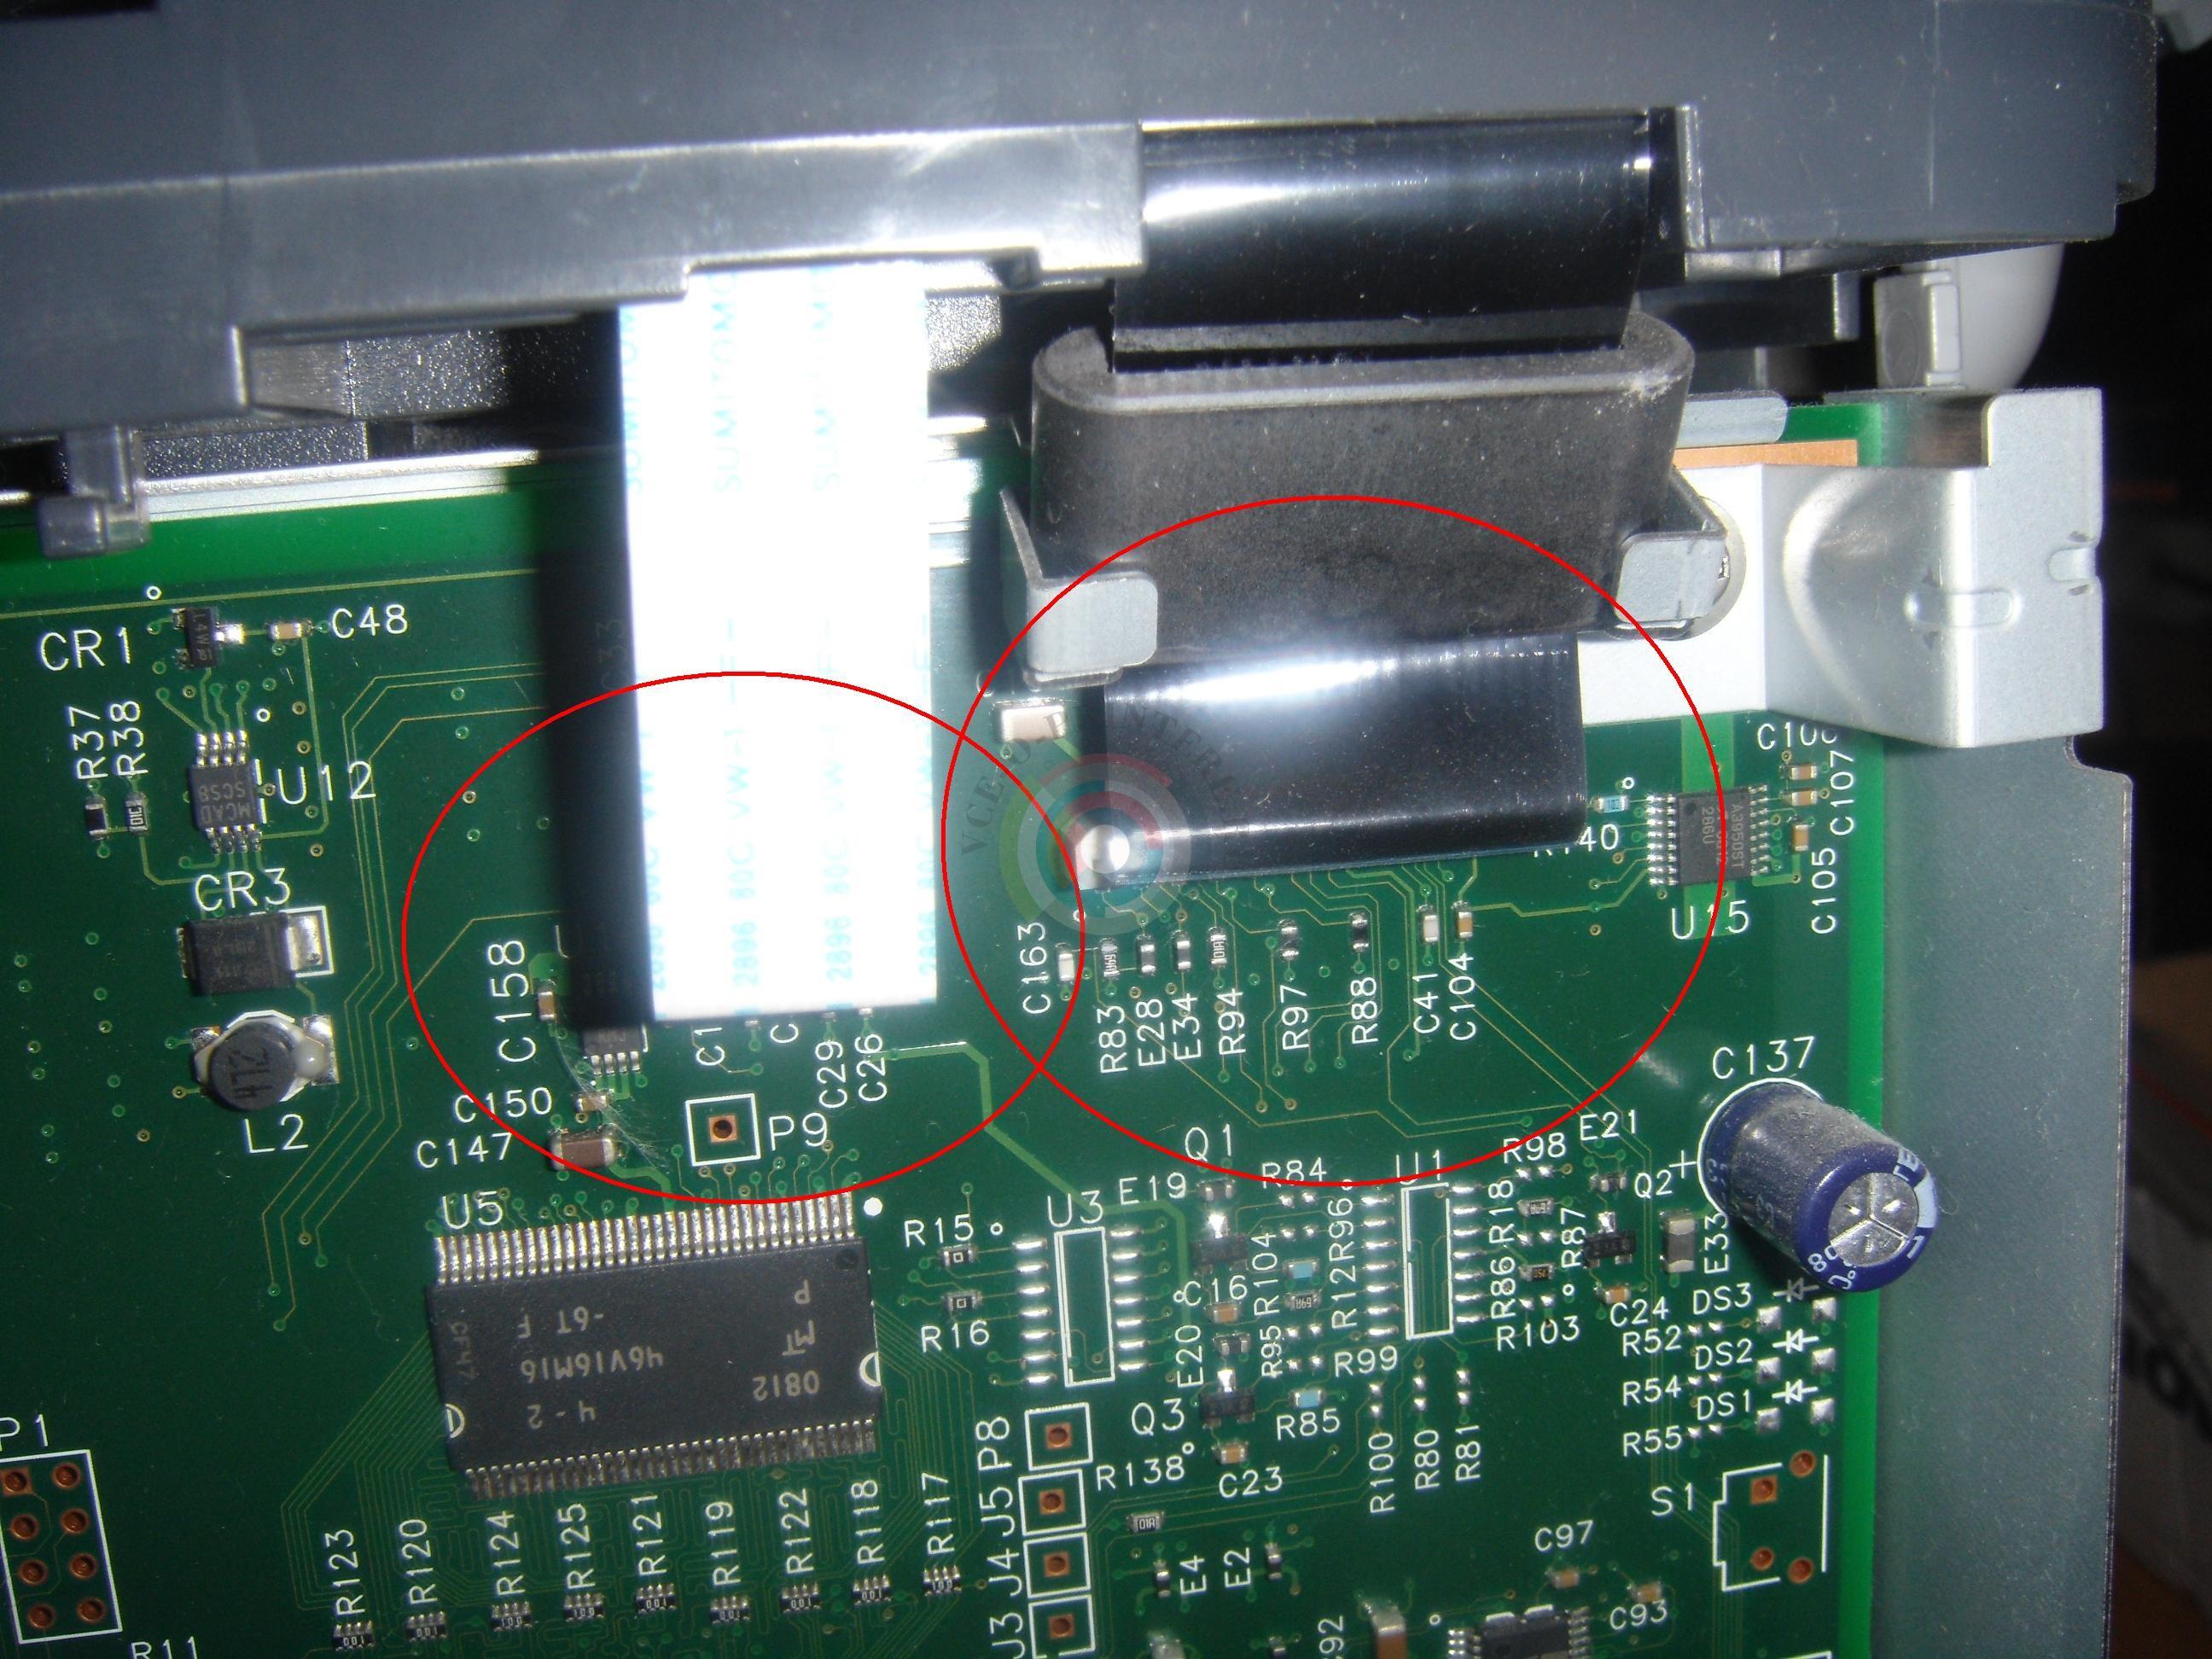 hp 2055 замена термопленки инструкция